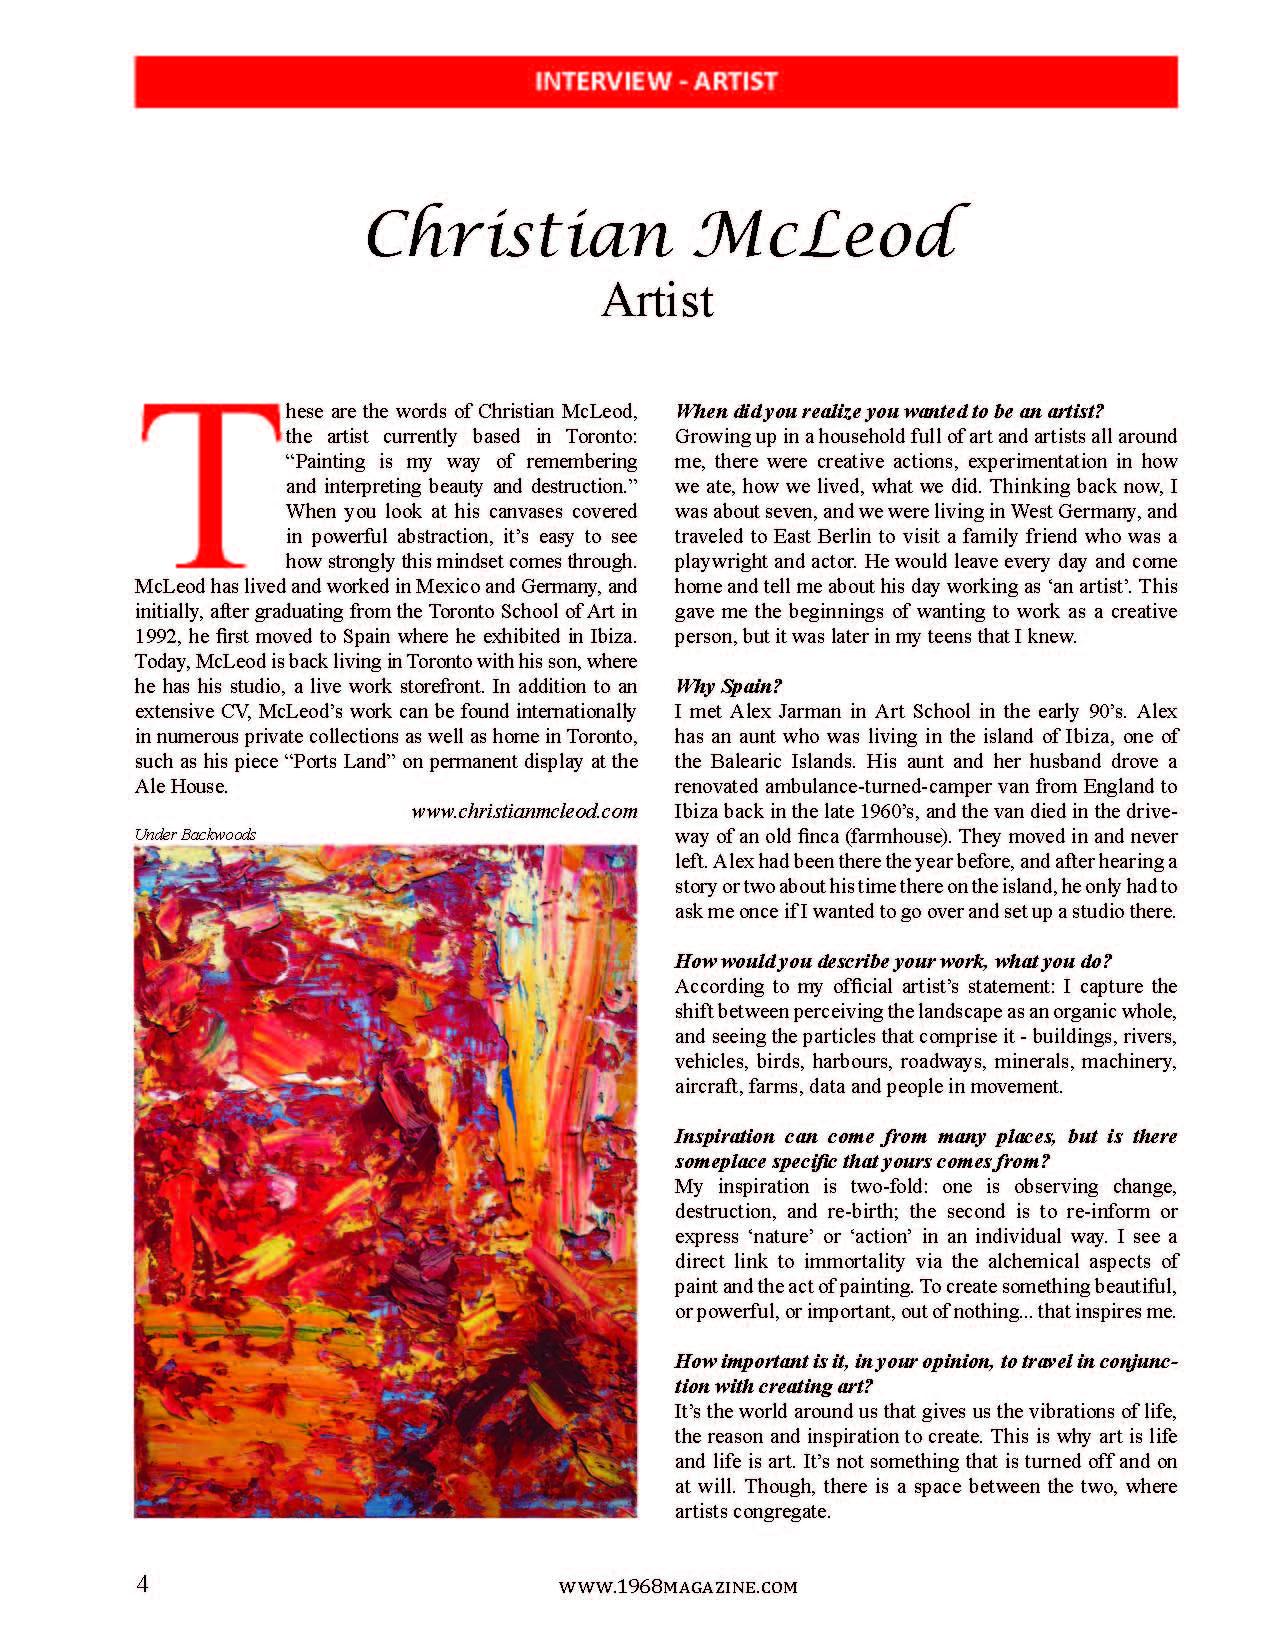 Christian_McLeod_1968_01_Page_1.jpg